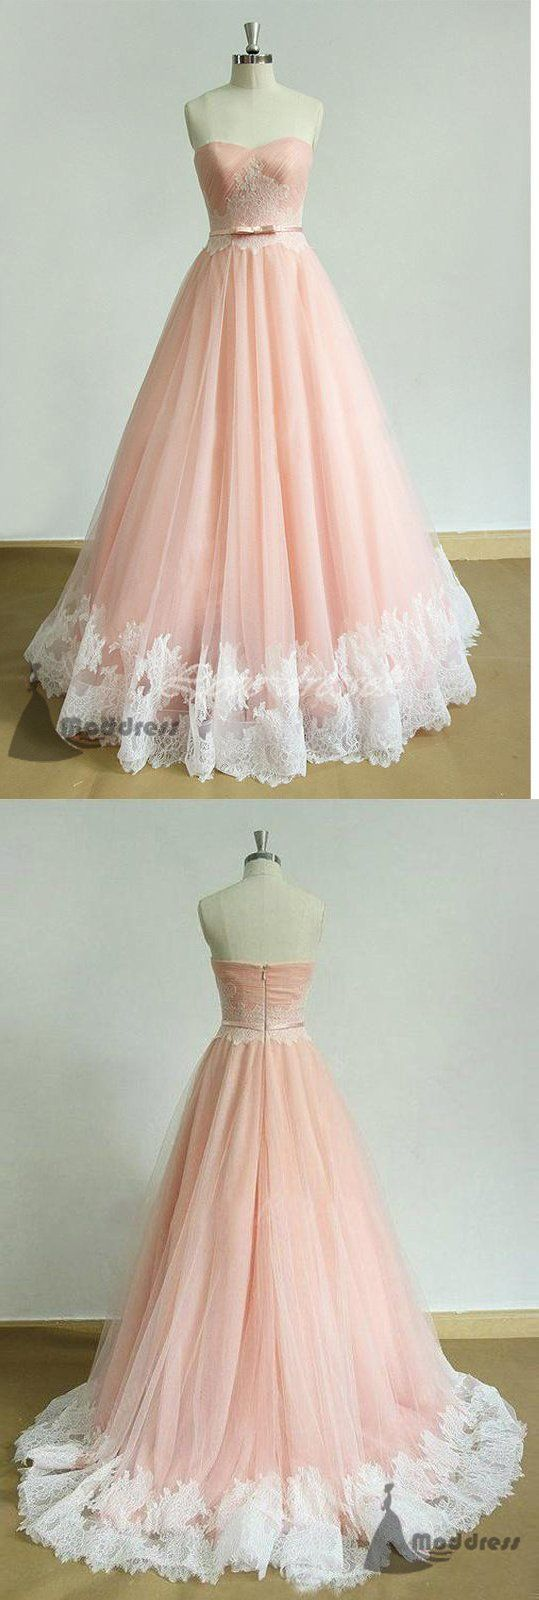 elegant long prom dress sweetheart applique a-line pink evening dress,HS369 3